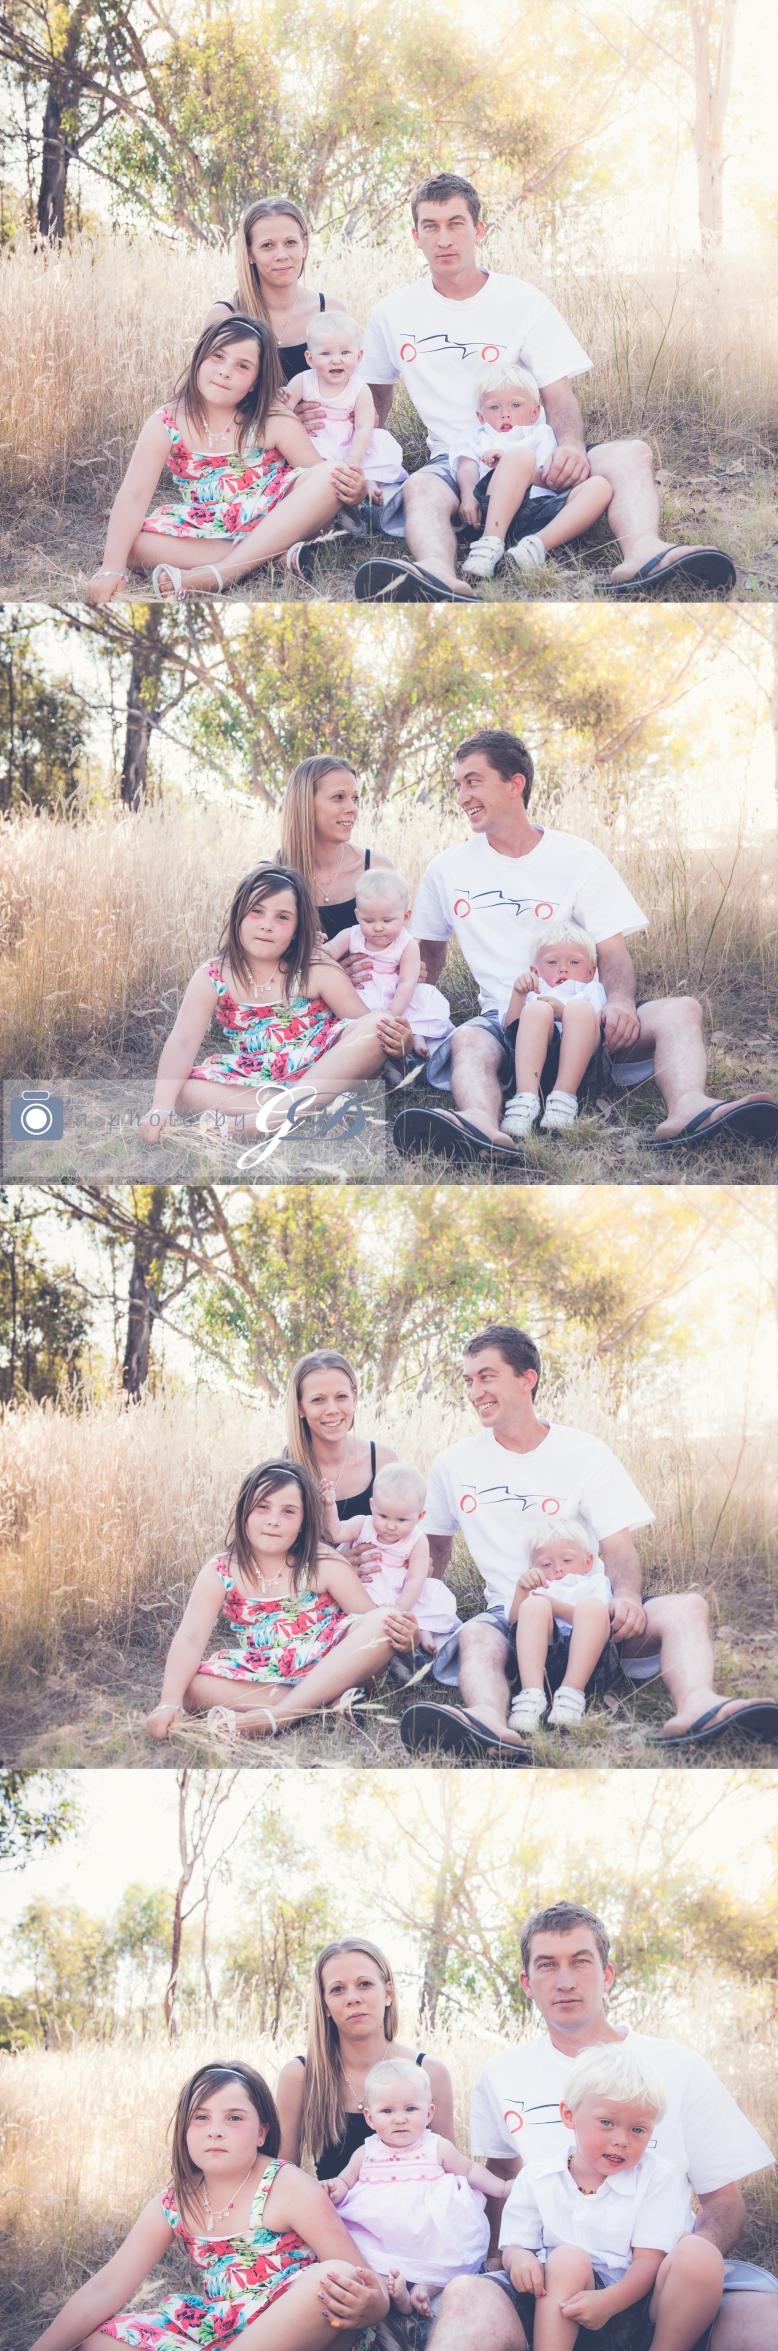 Albury Family Photography